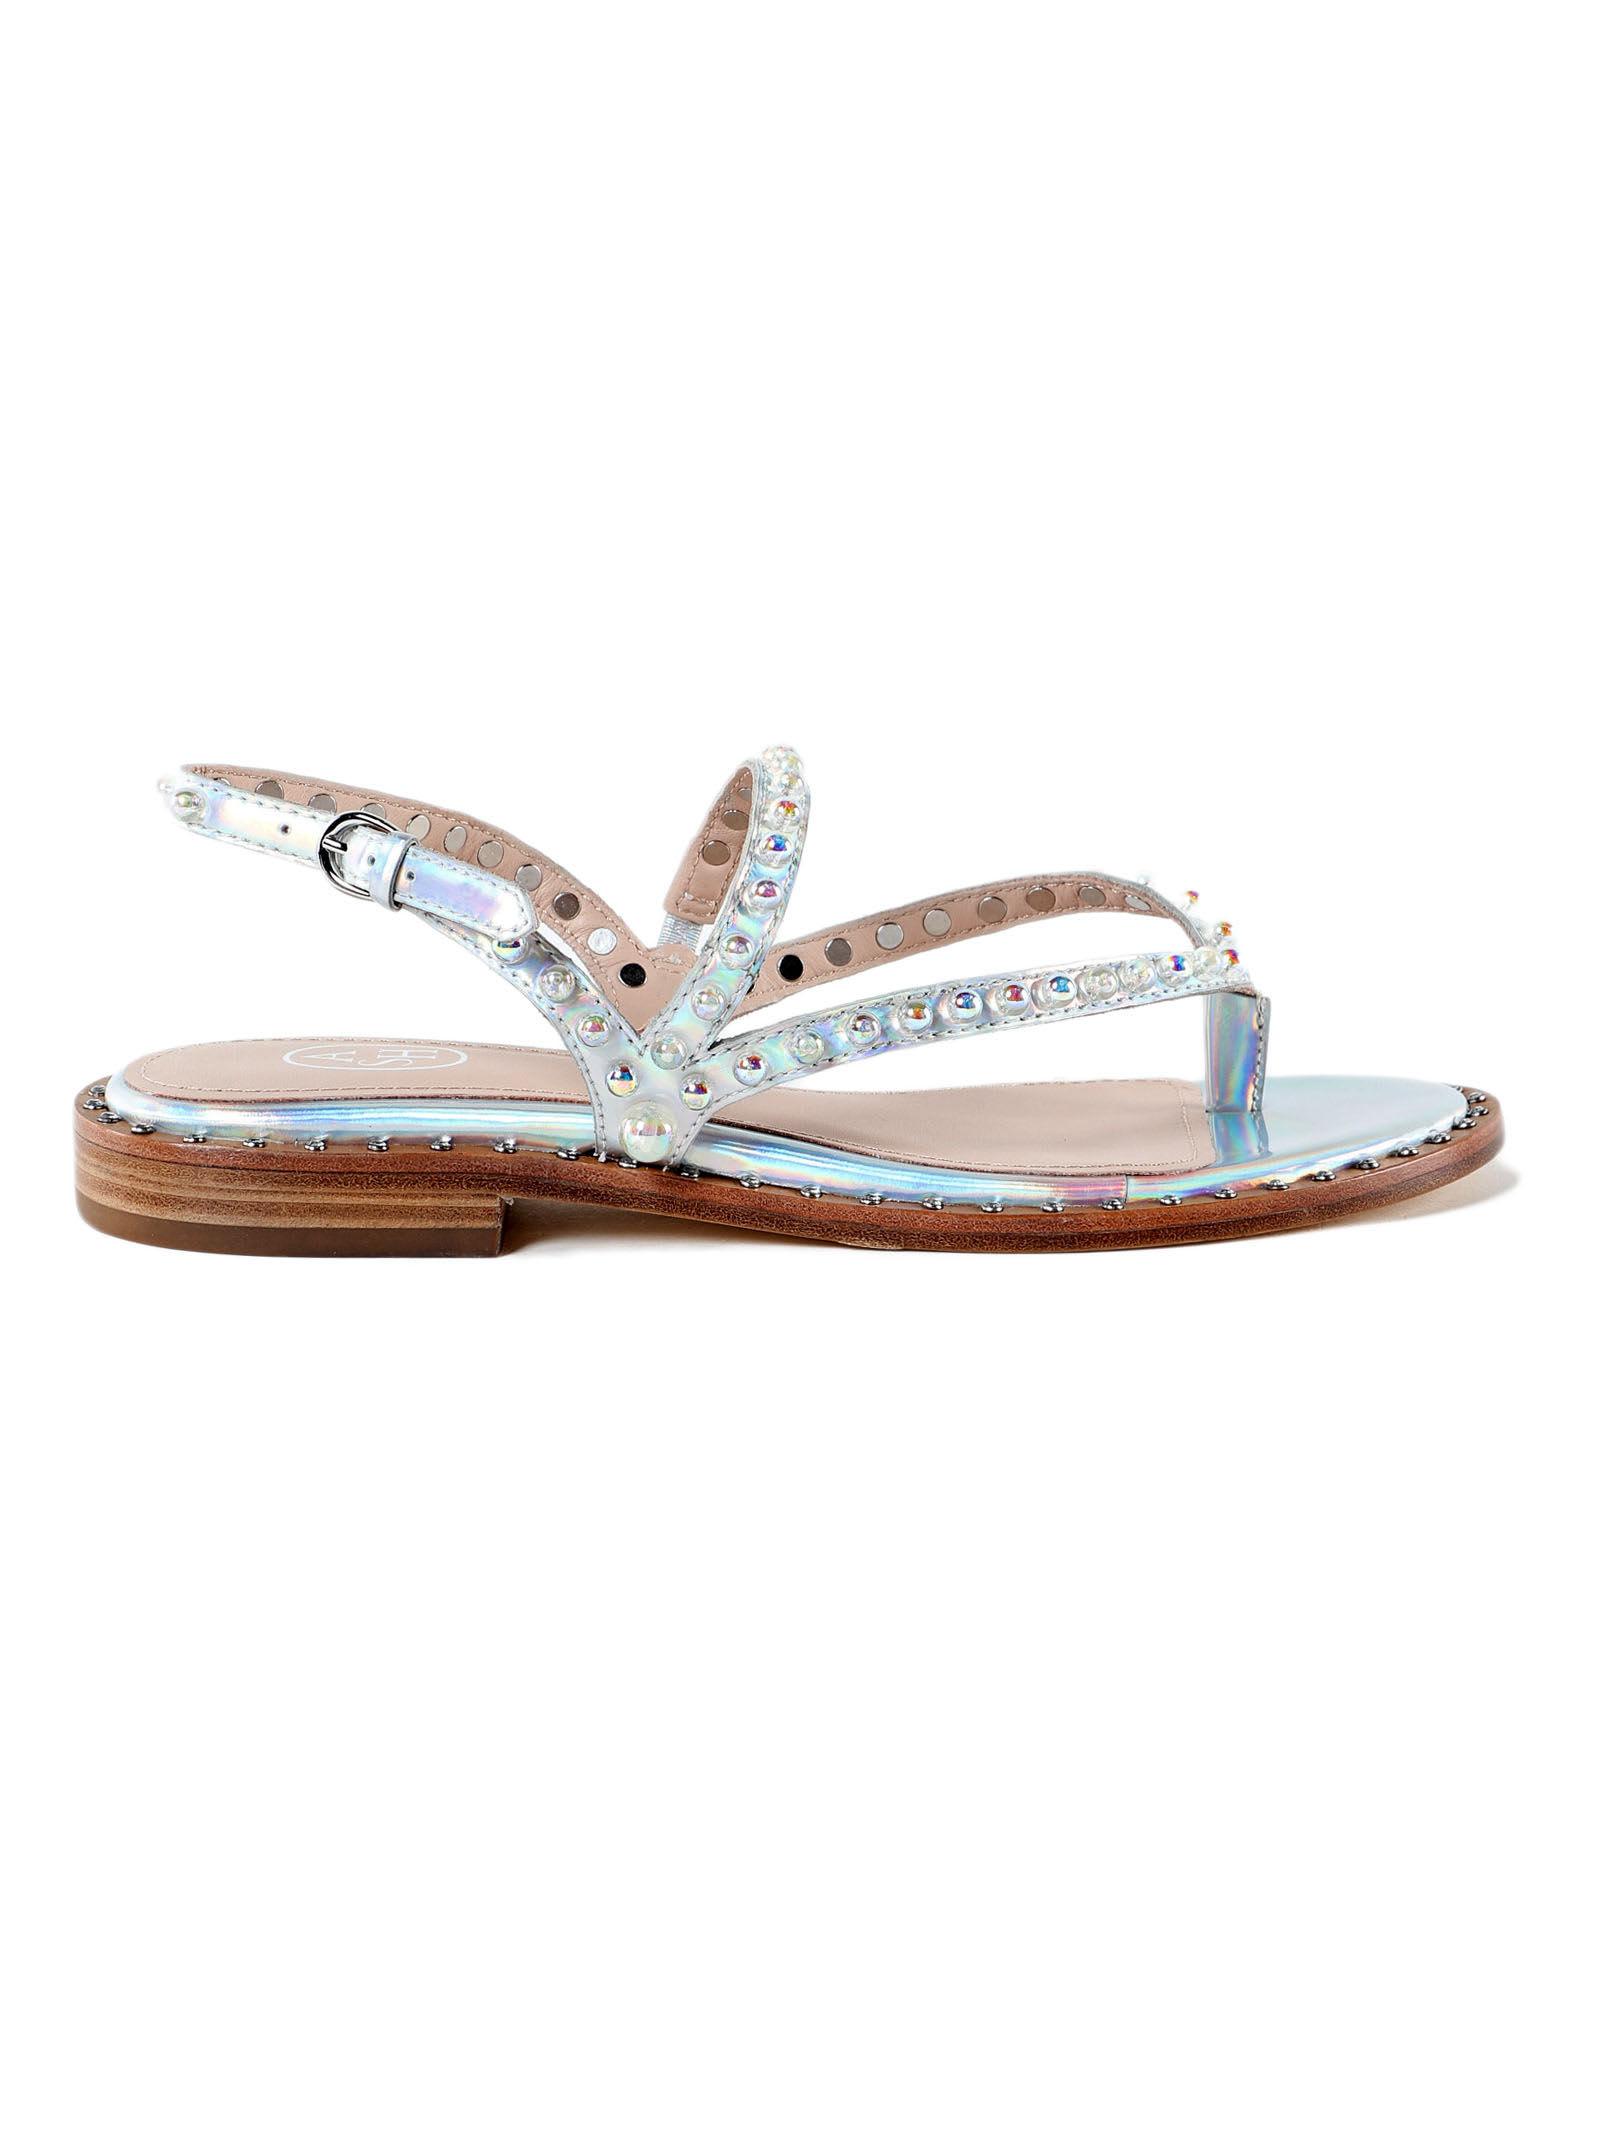 9dbbeb52c Ash Ash Pearl Flat Sandals - Rainbow Silver - 10794227 | italist